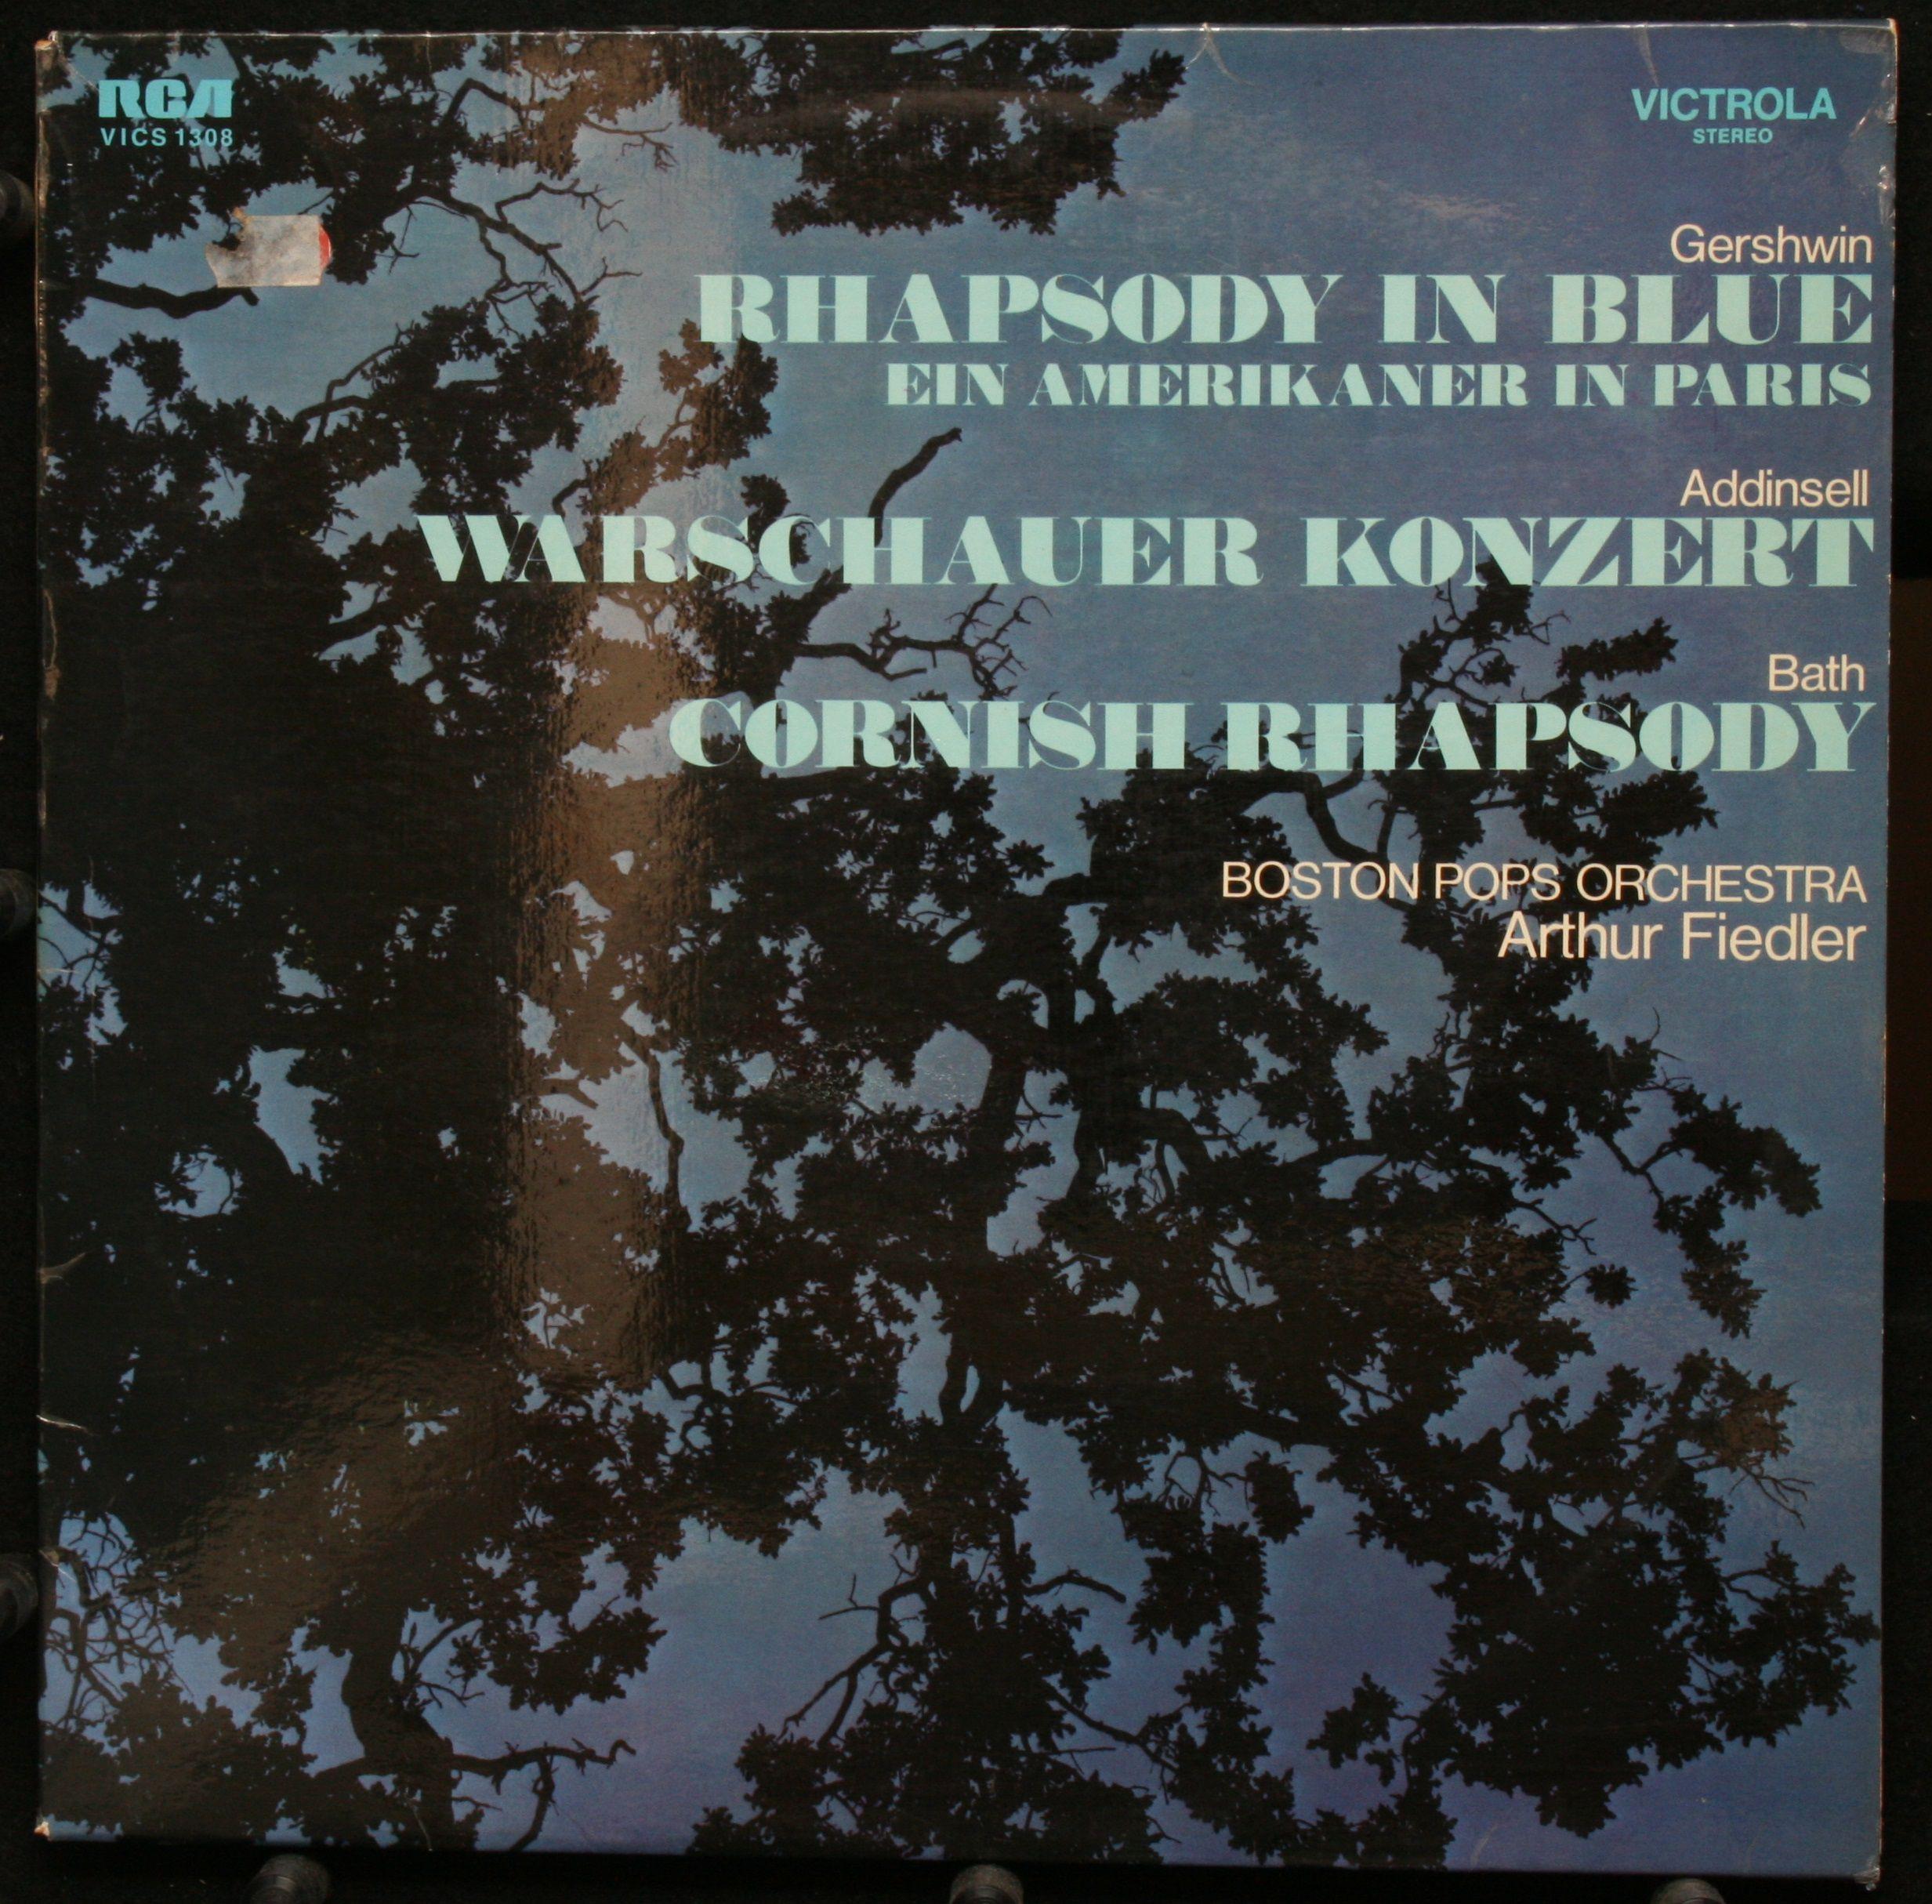 Boston Pops Orchestra | Fiedler, Arthur | Gershwin Rhapsody in blue- Ein Amerikaner in Paris